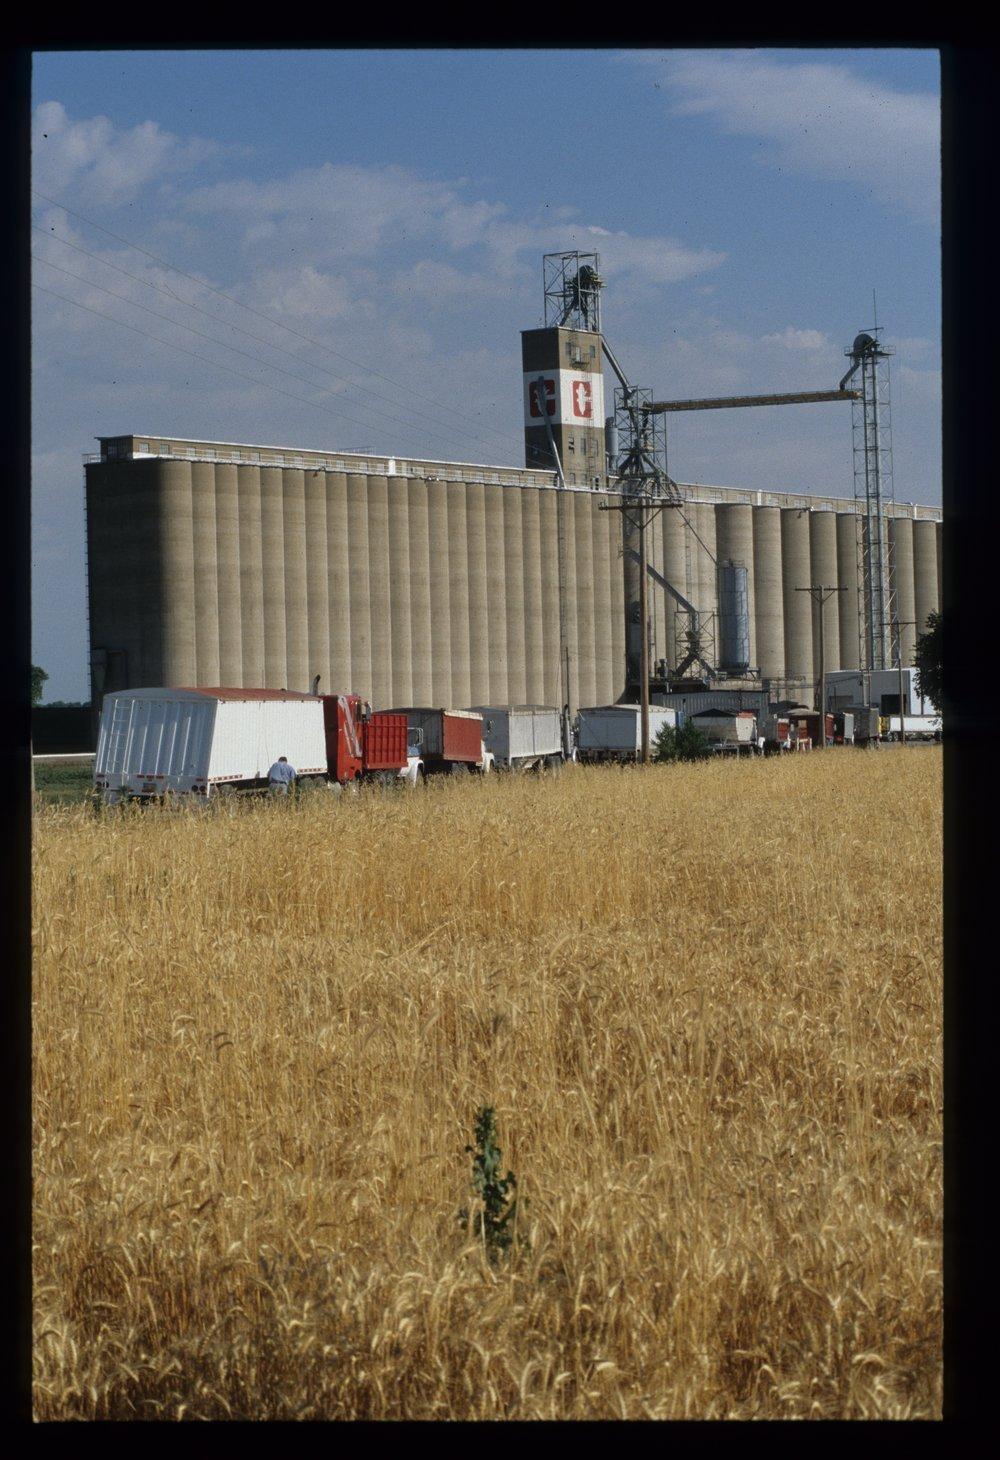 Hutchinson grain elevator, Hutchinson, Kansas - 1